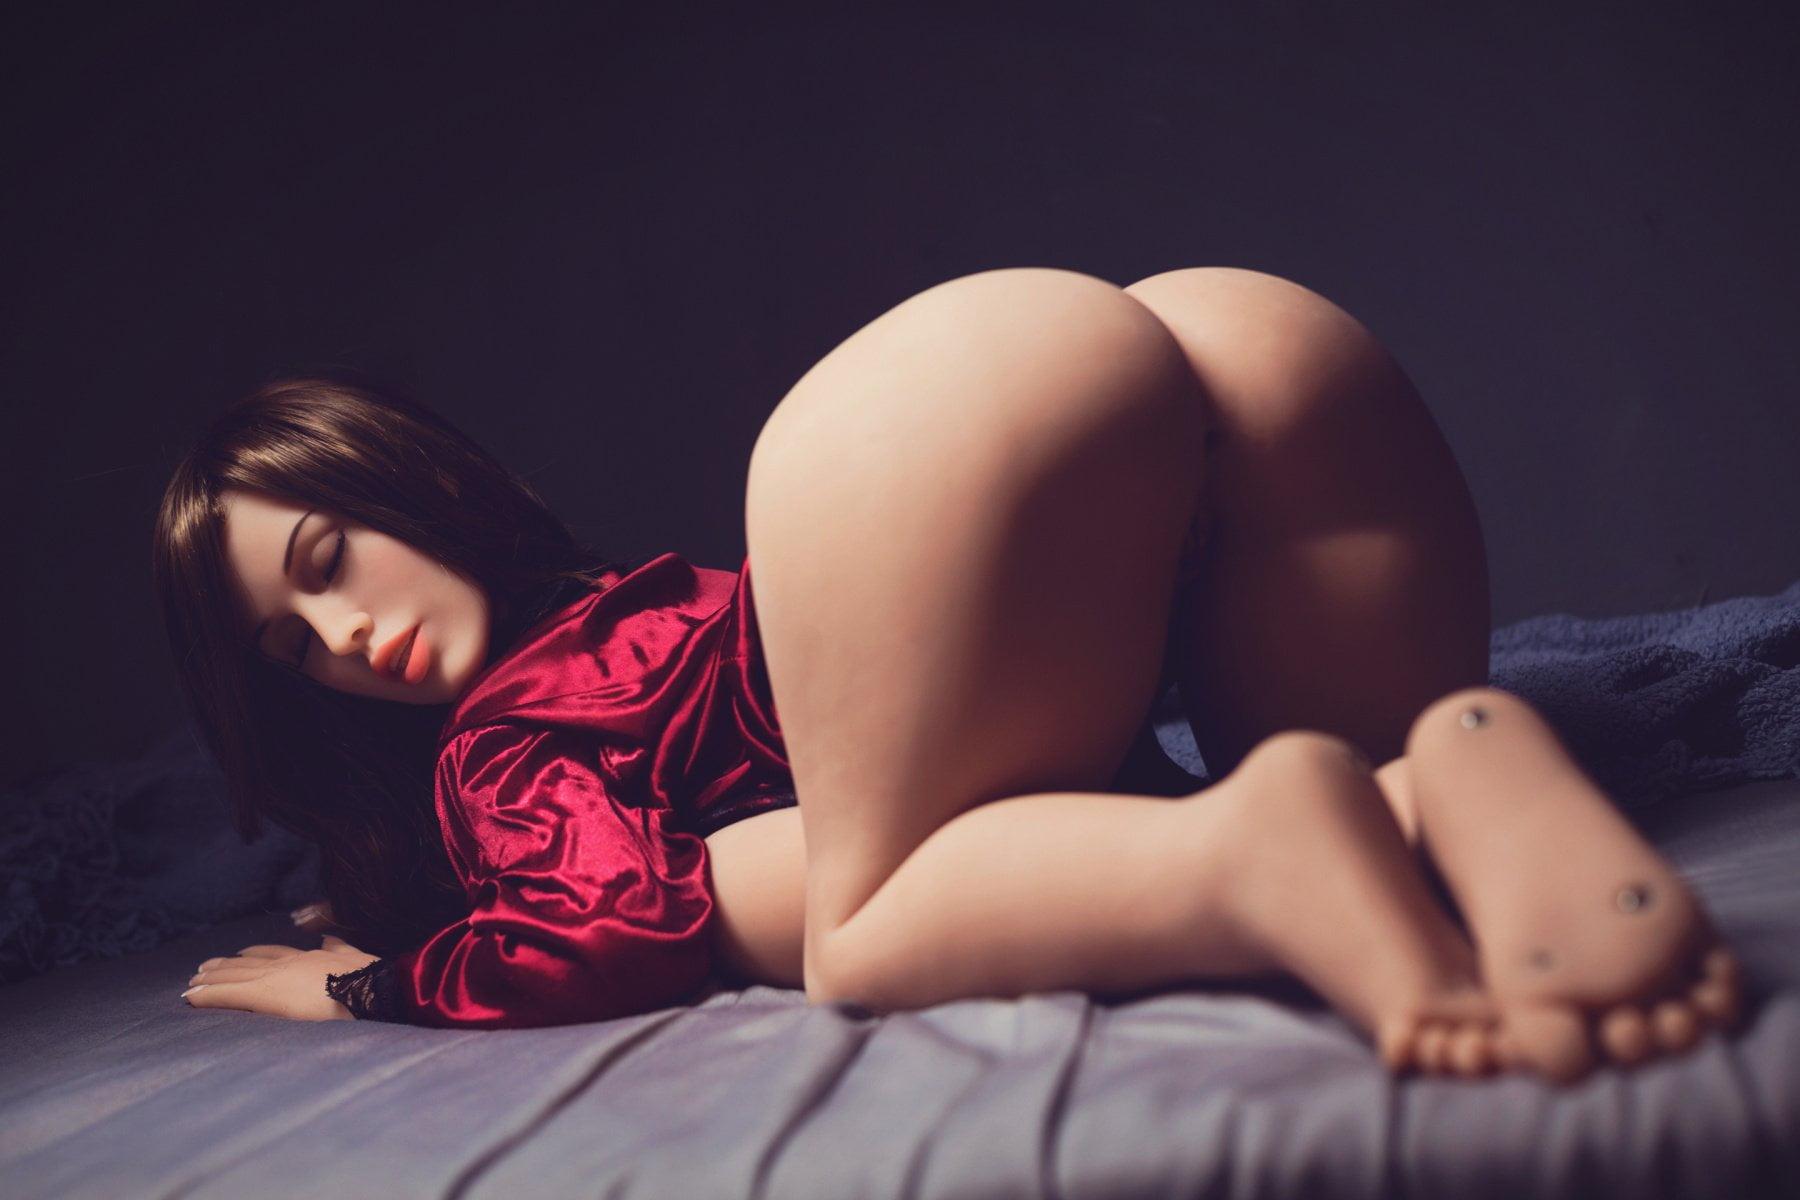 Midget Sex Doll